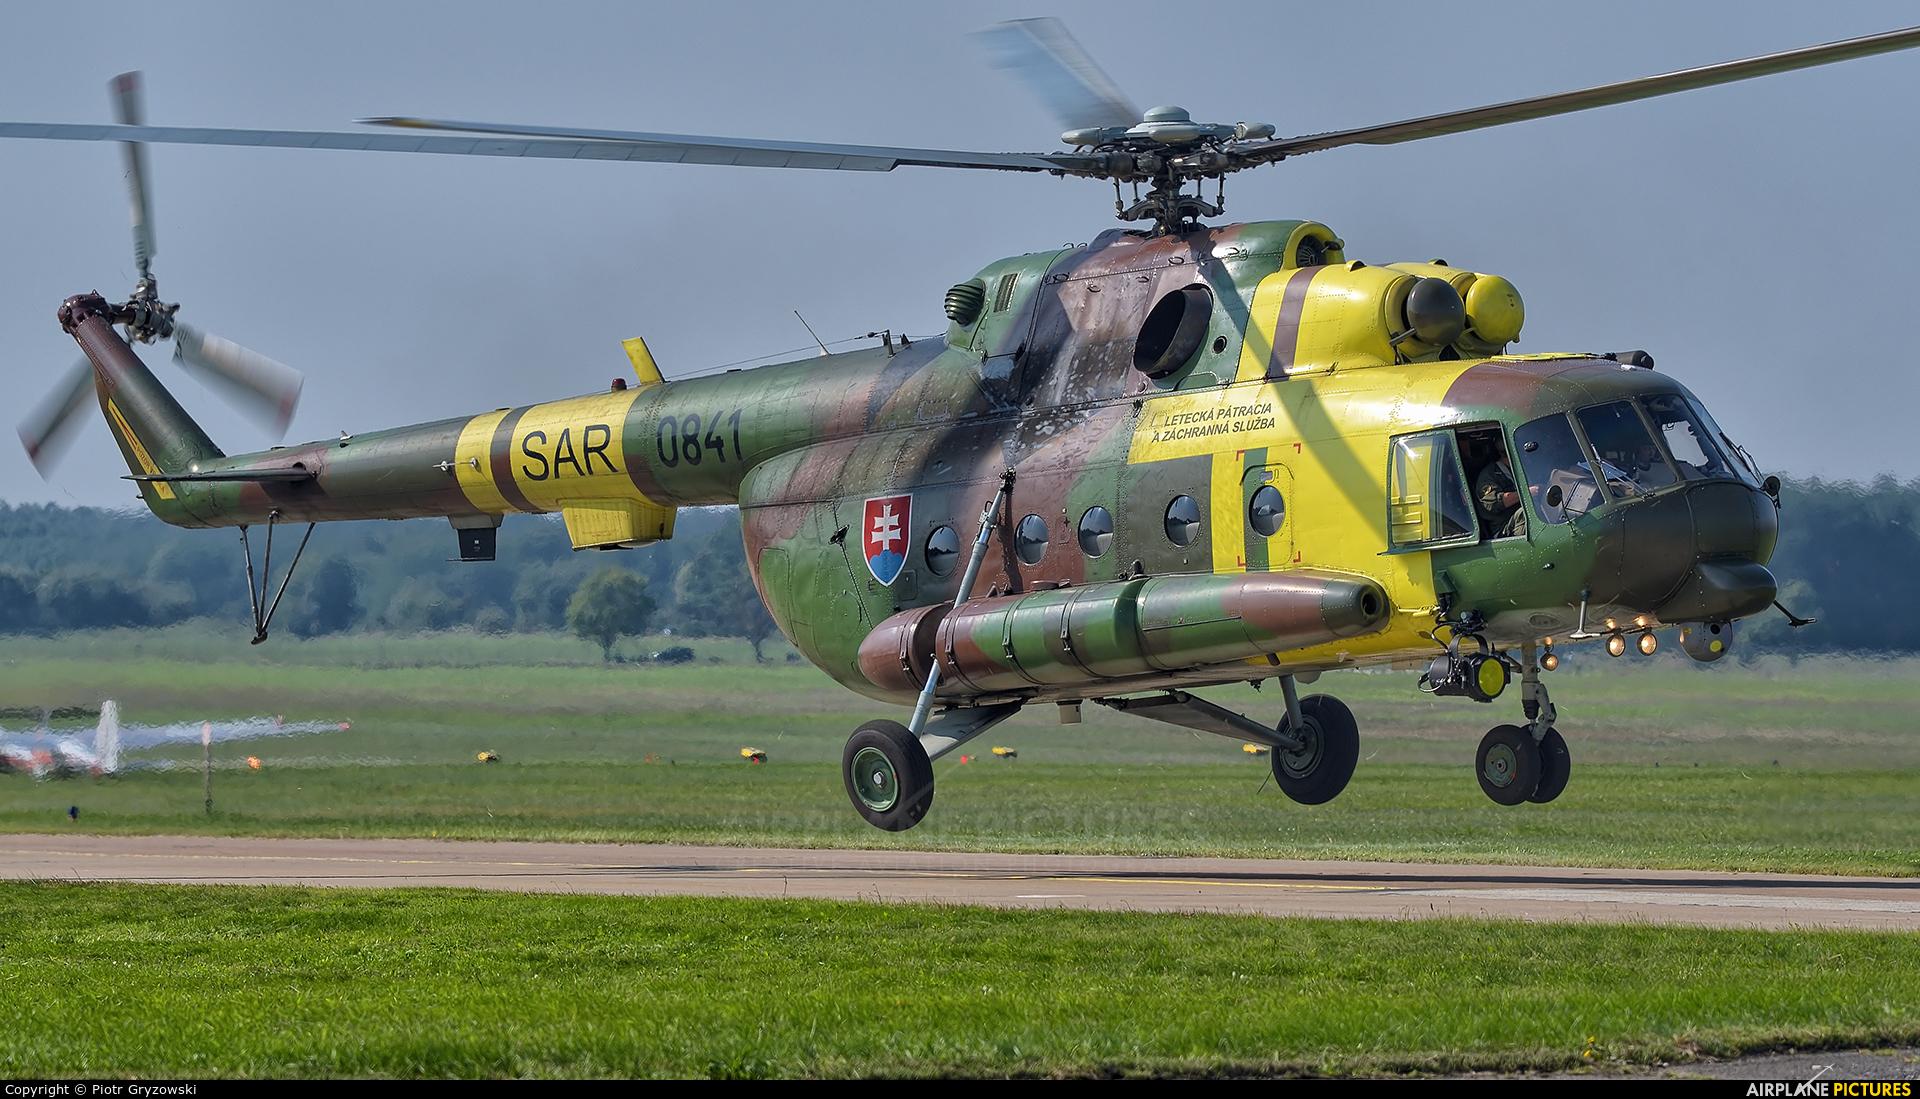 Slovakia -  Air Force 0841 aircraft at Malacky - Kuchyna